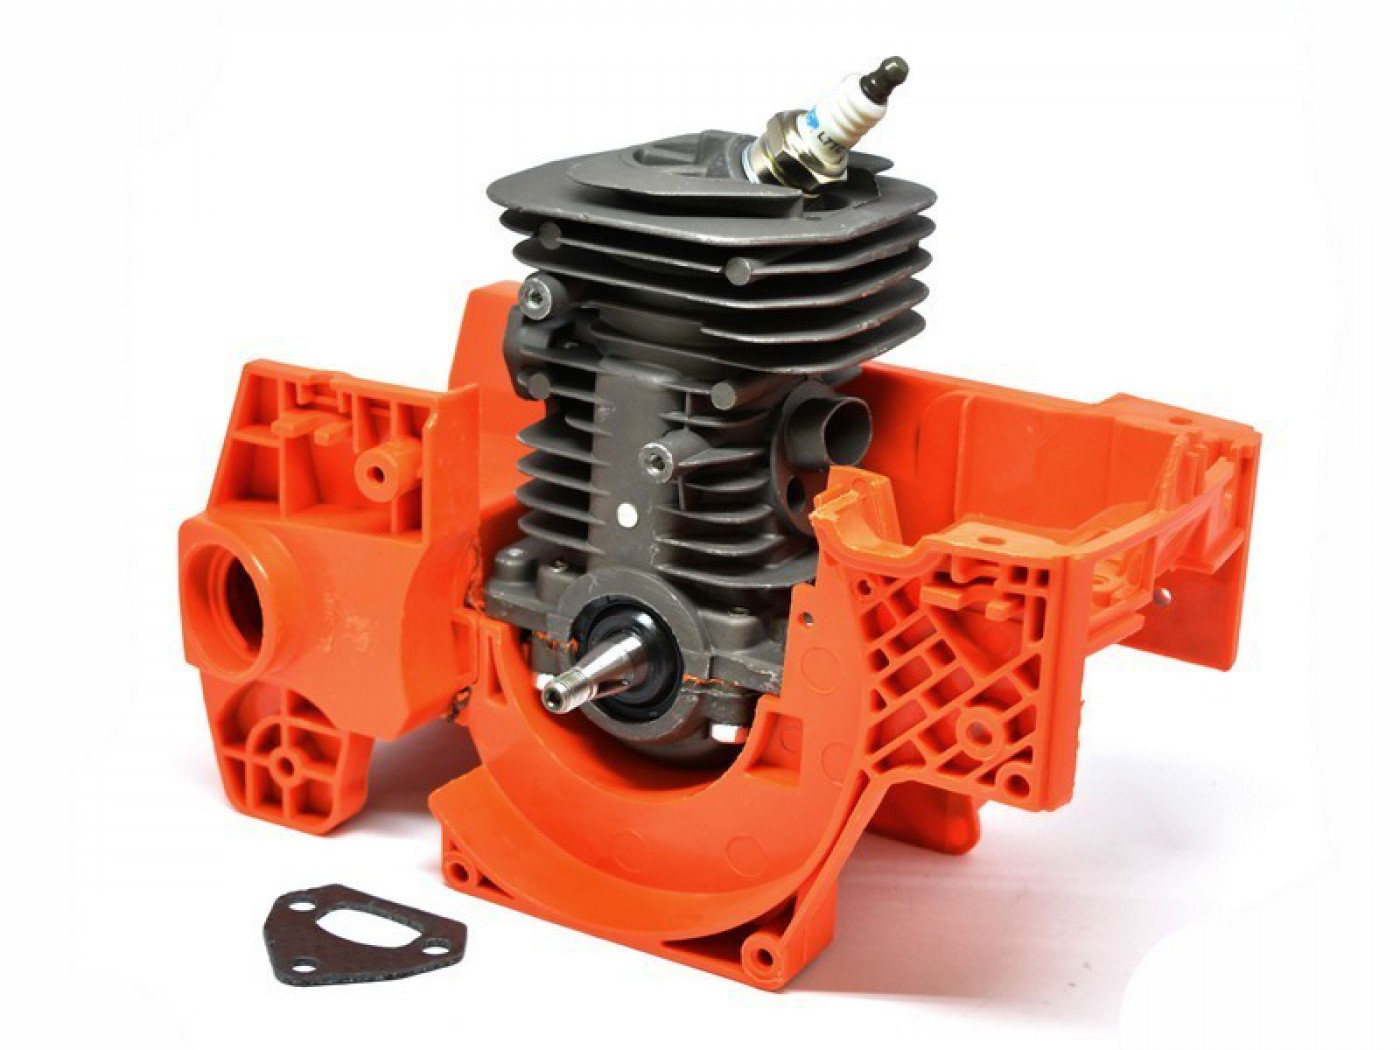 Motor Jonsered 2036 2040 - UŠETRÍTE 25 Eur + kľuková skriňa